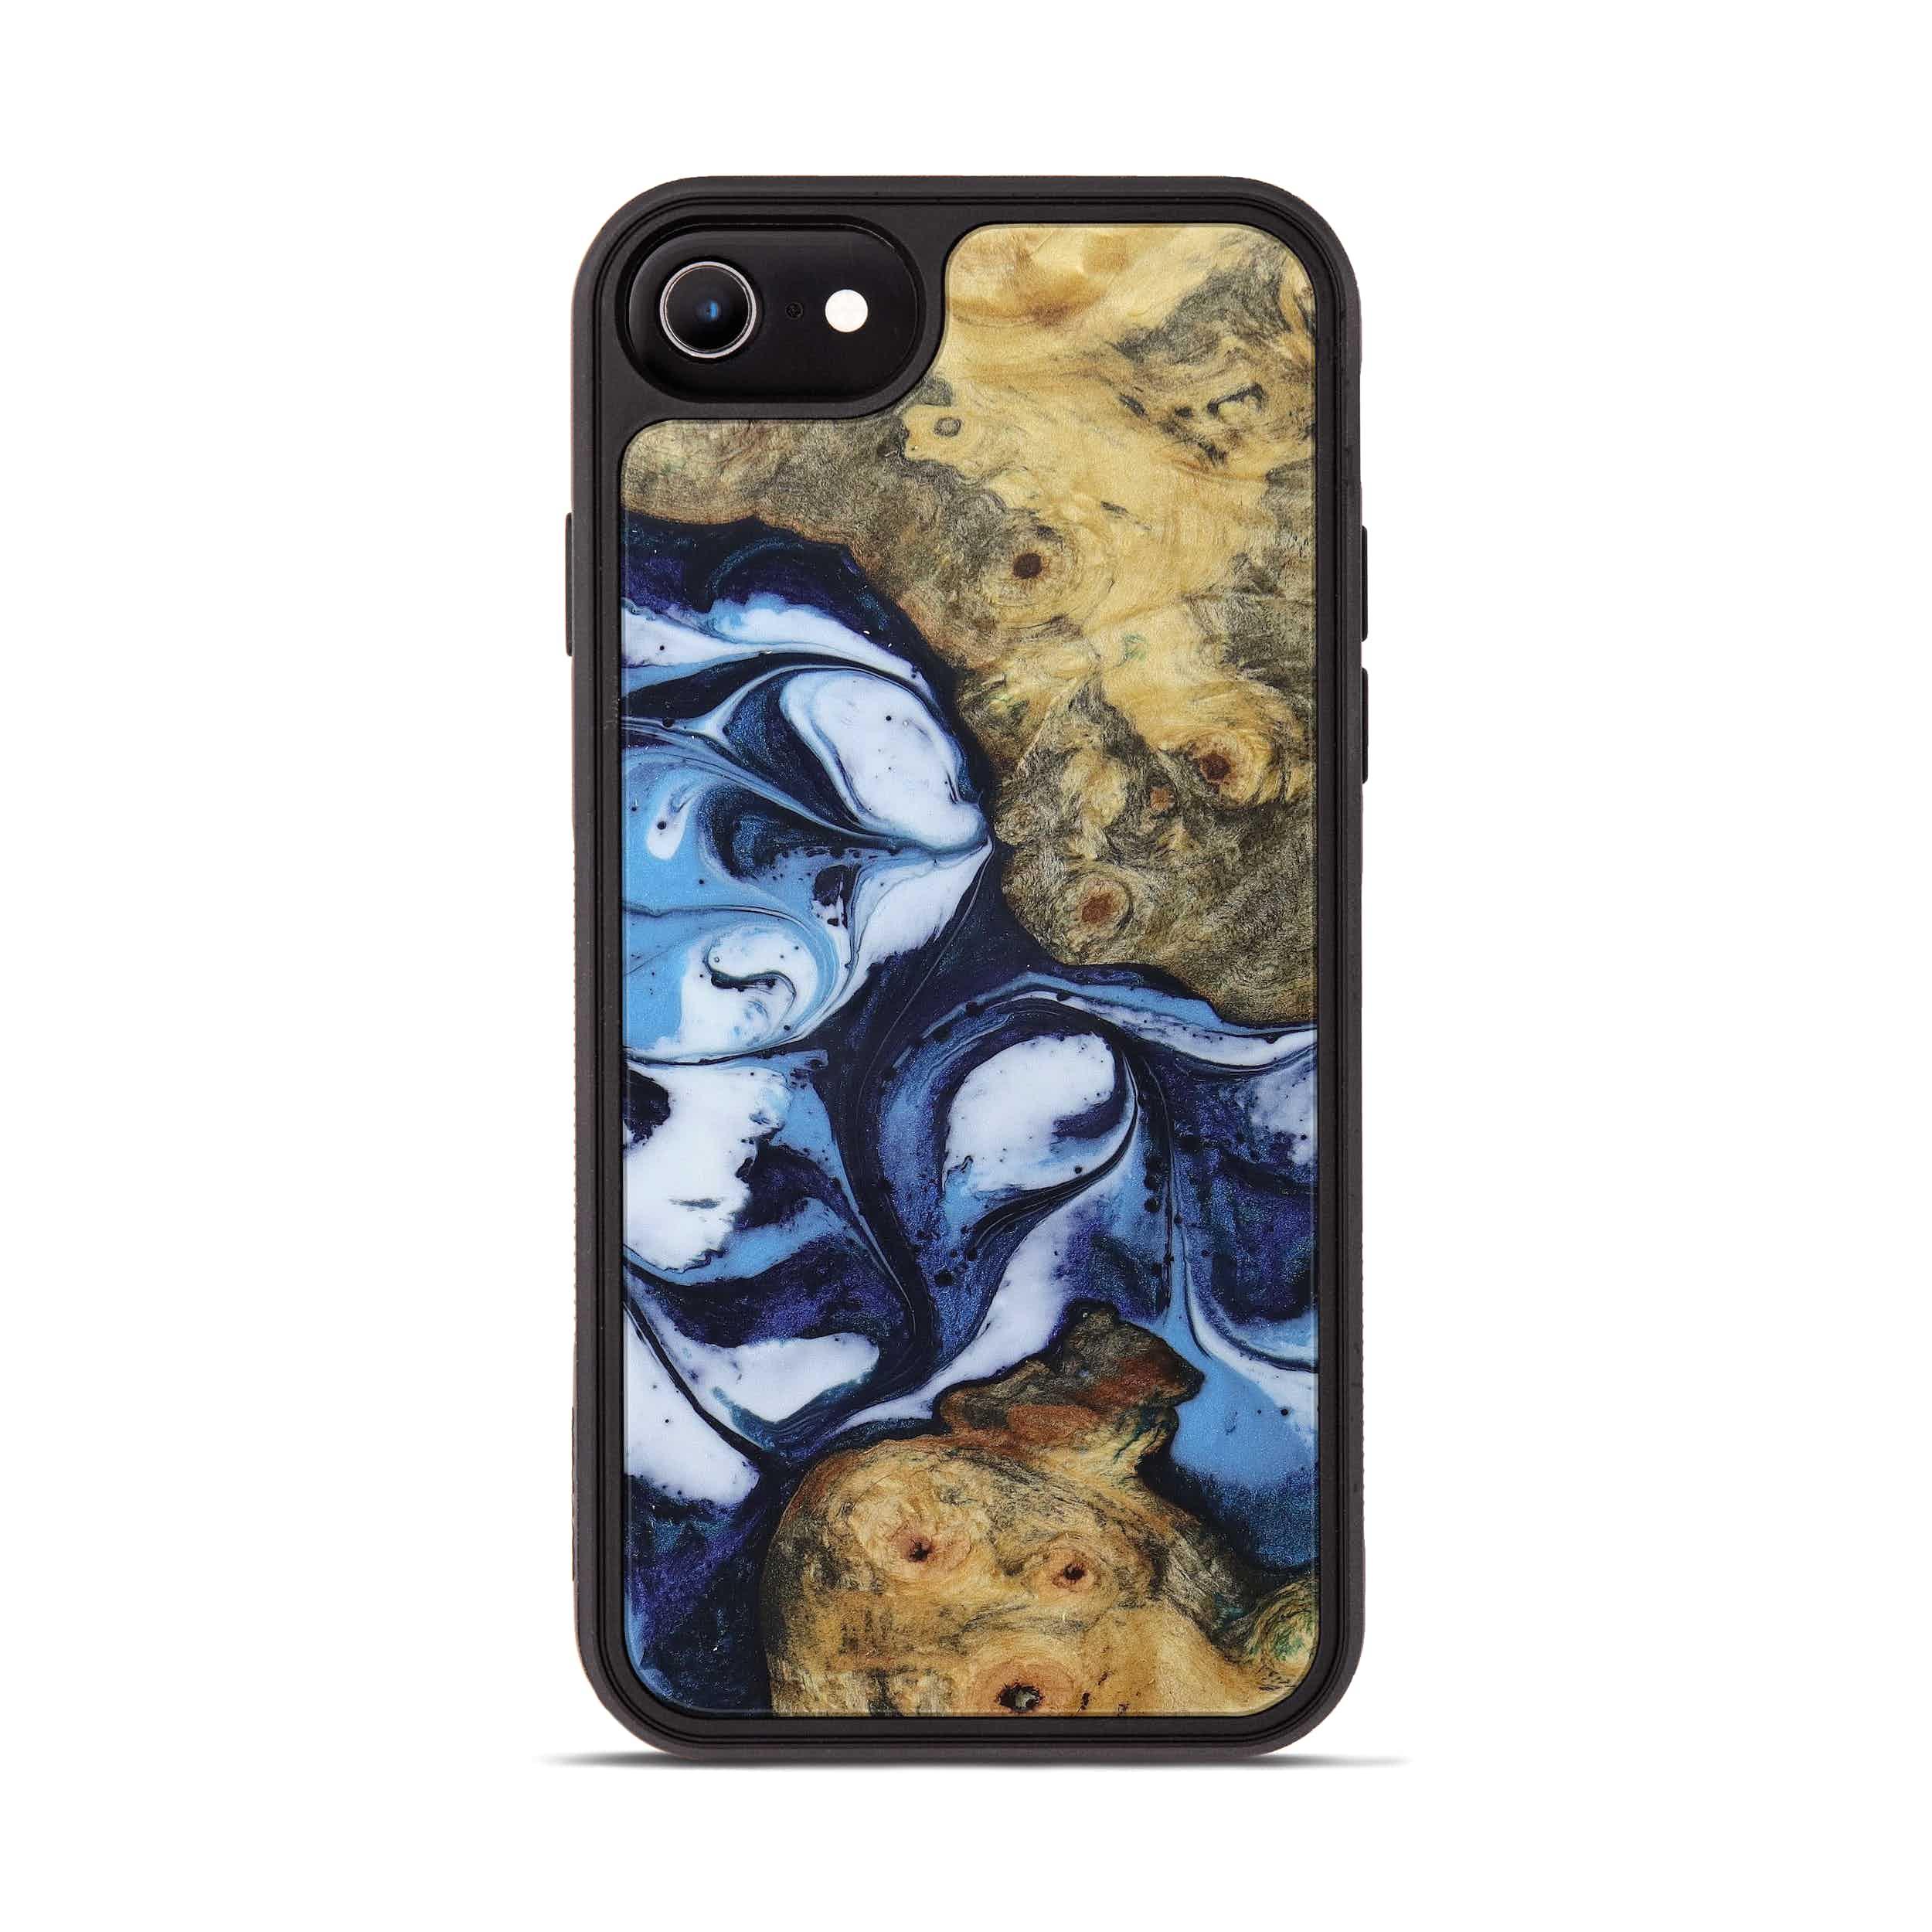 iPhone 8 Wood+Resin Phone Case - Midge (Dark Blue, 394889)